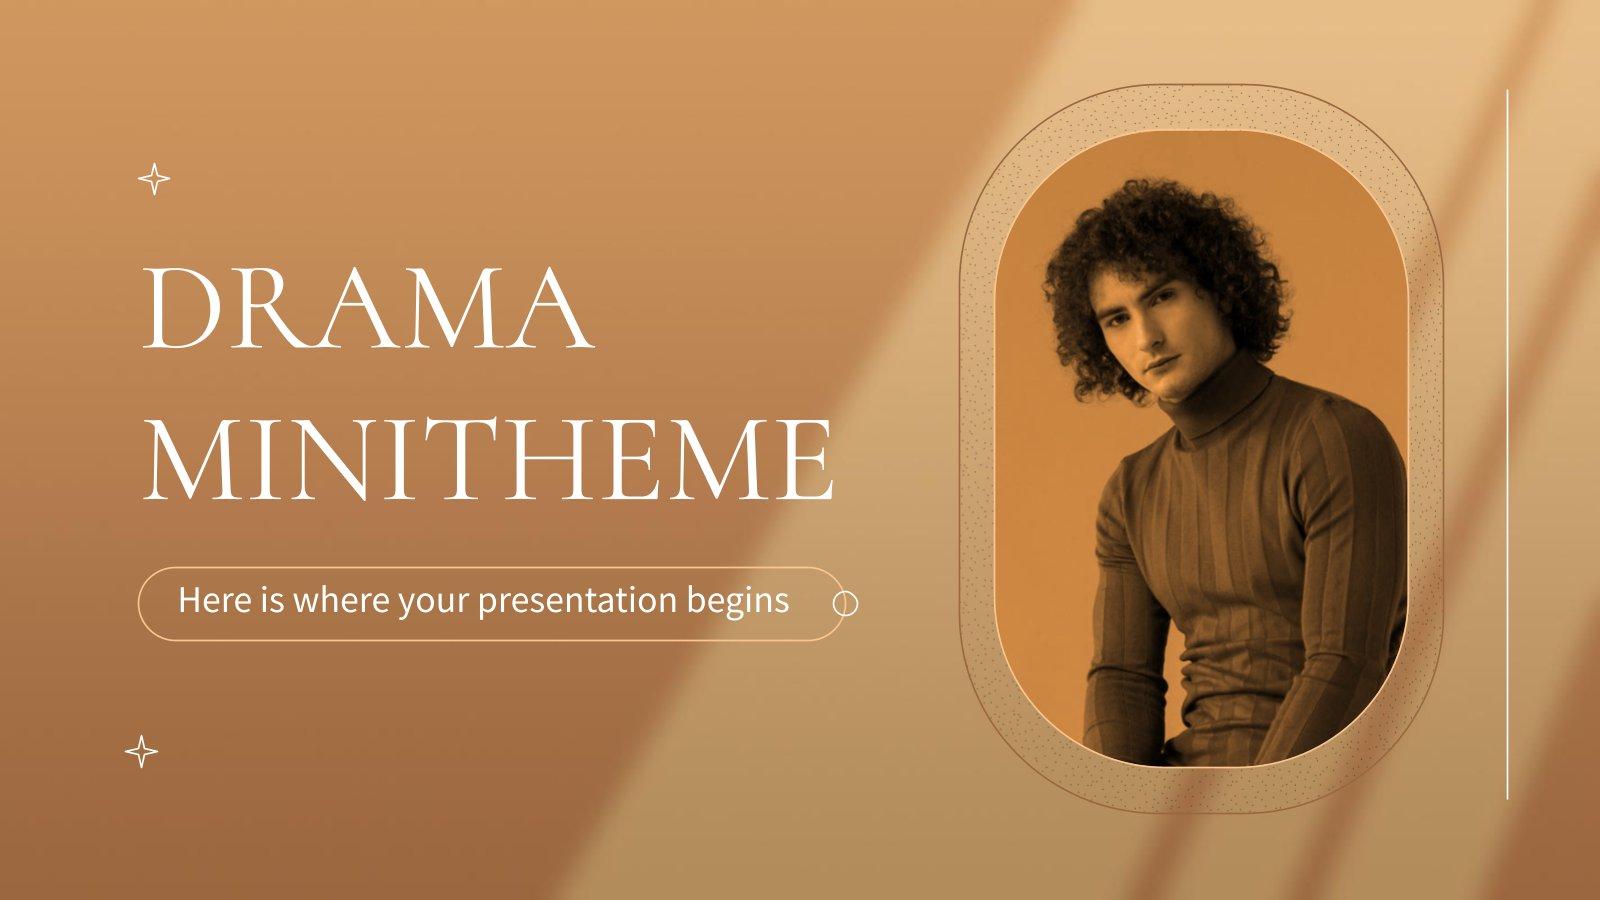 Drama Minitheme presentation template